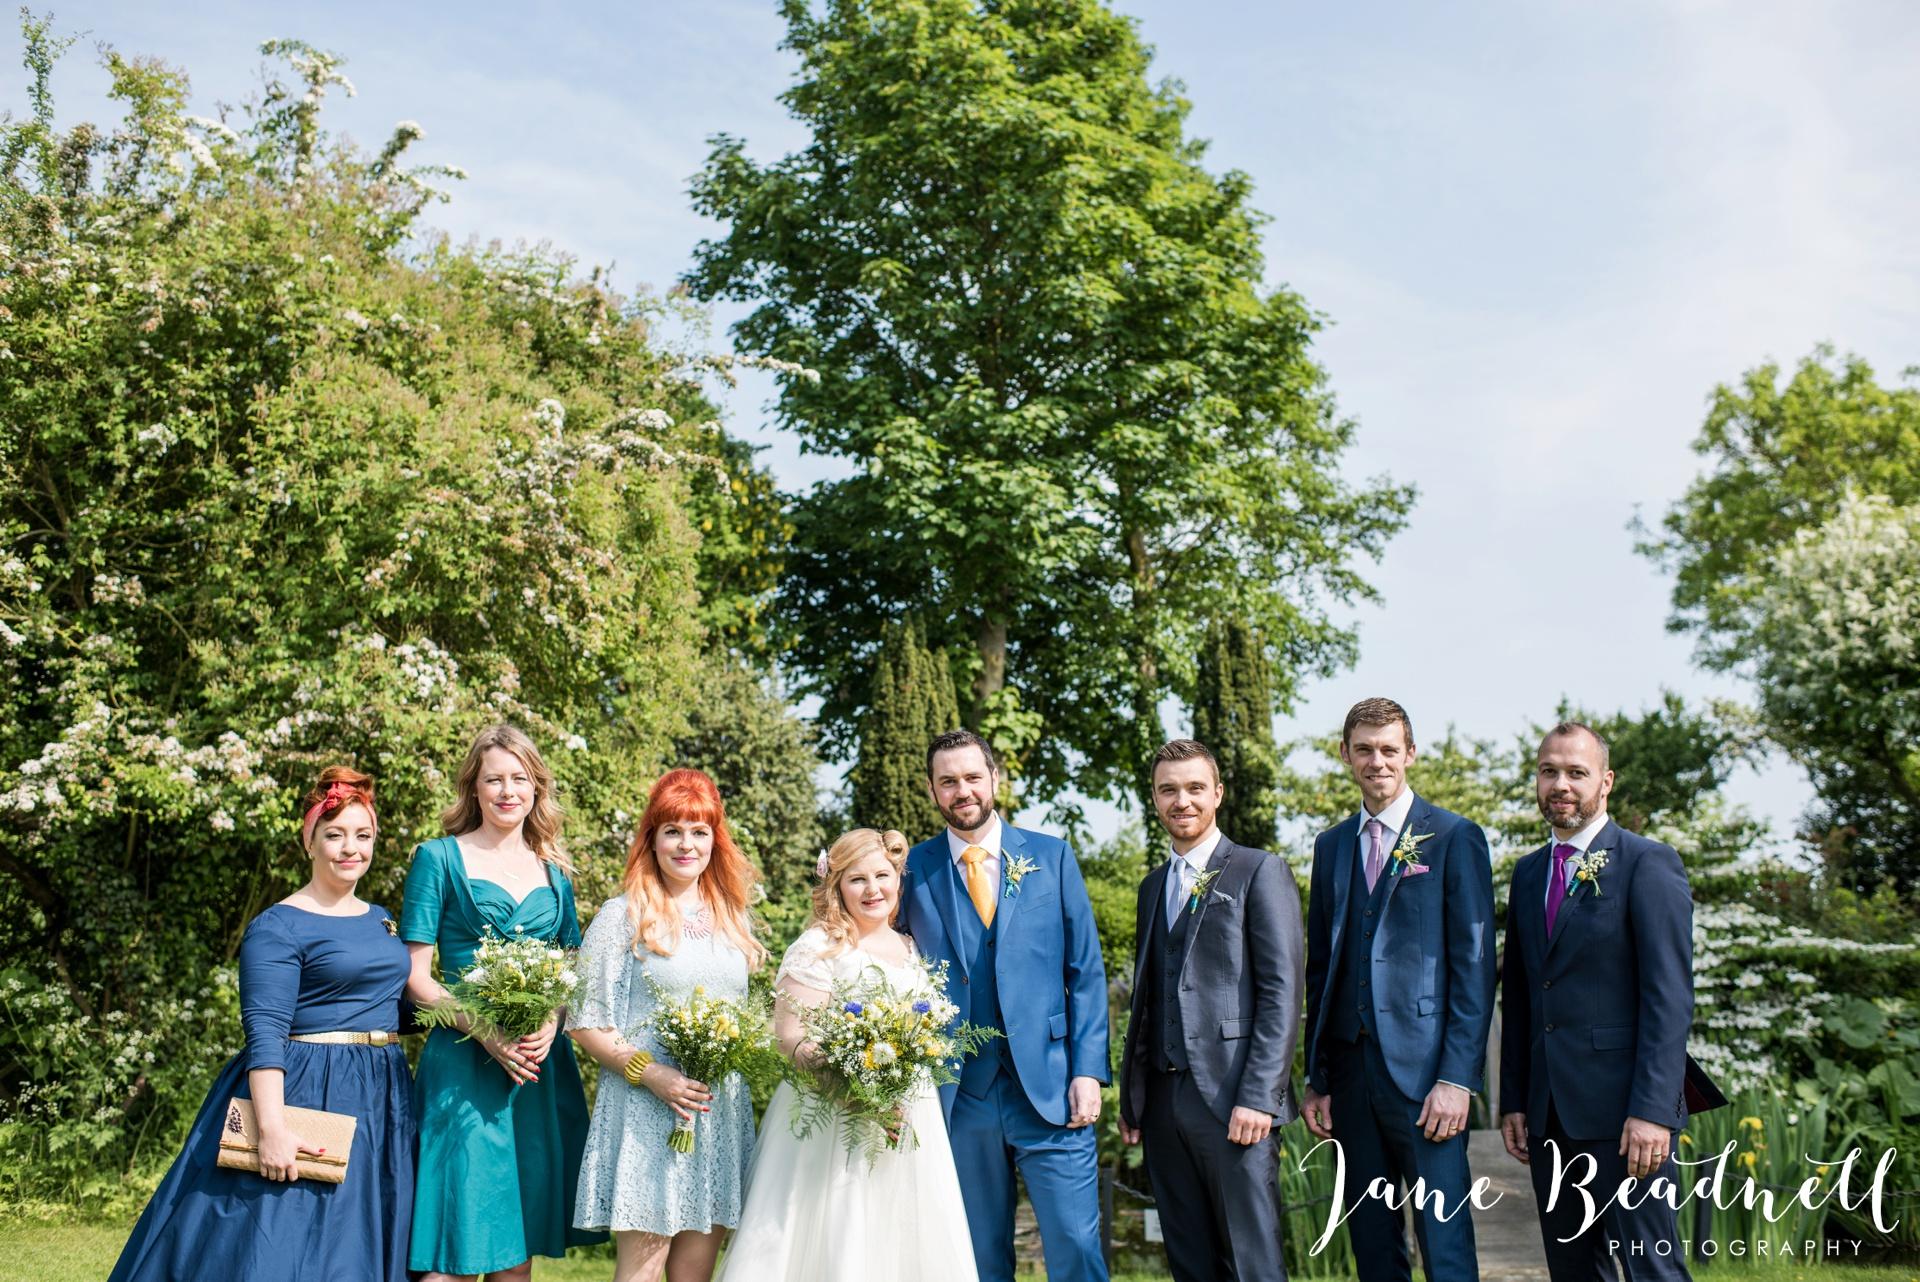 South Farm Wedding photography Hertfordshire by Jane Beadnell Photography fine art wedding photographer_0101